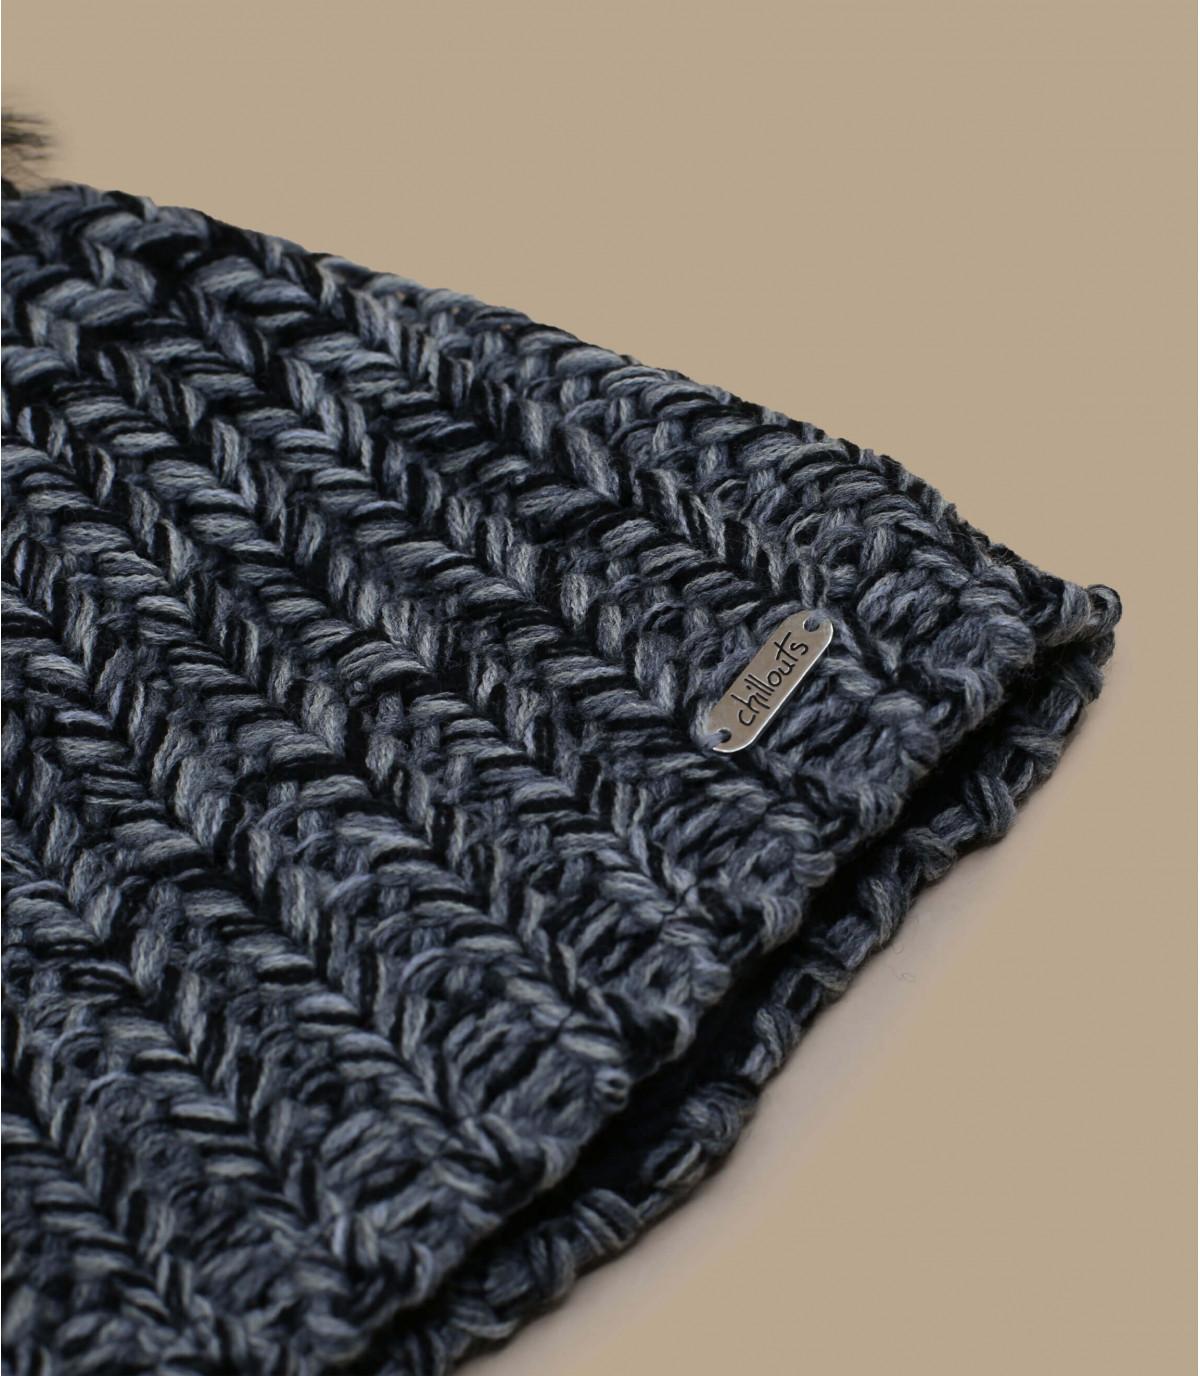 Dettagli Curly hat black grey - image 2